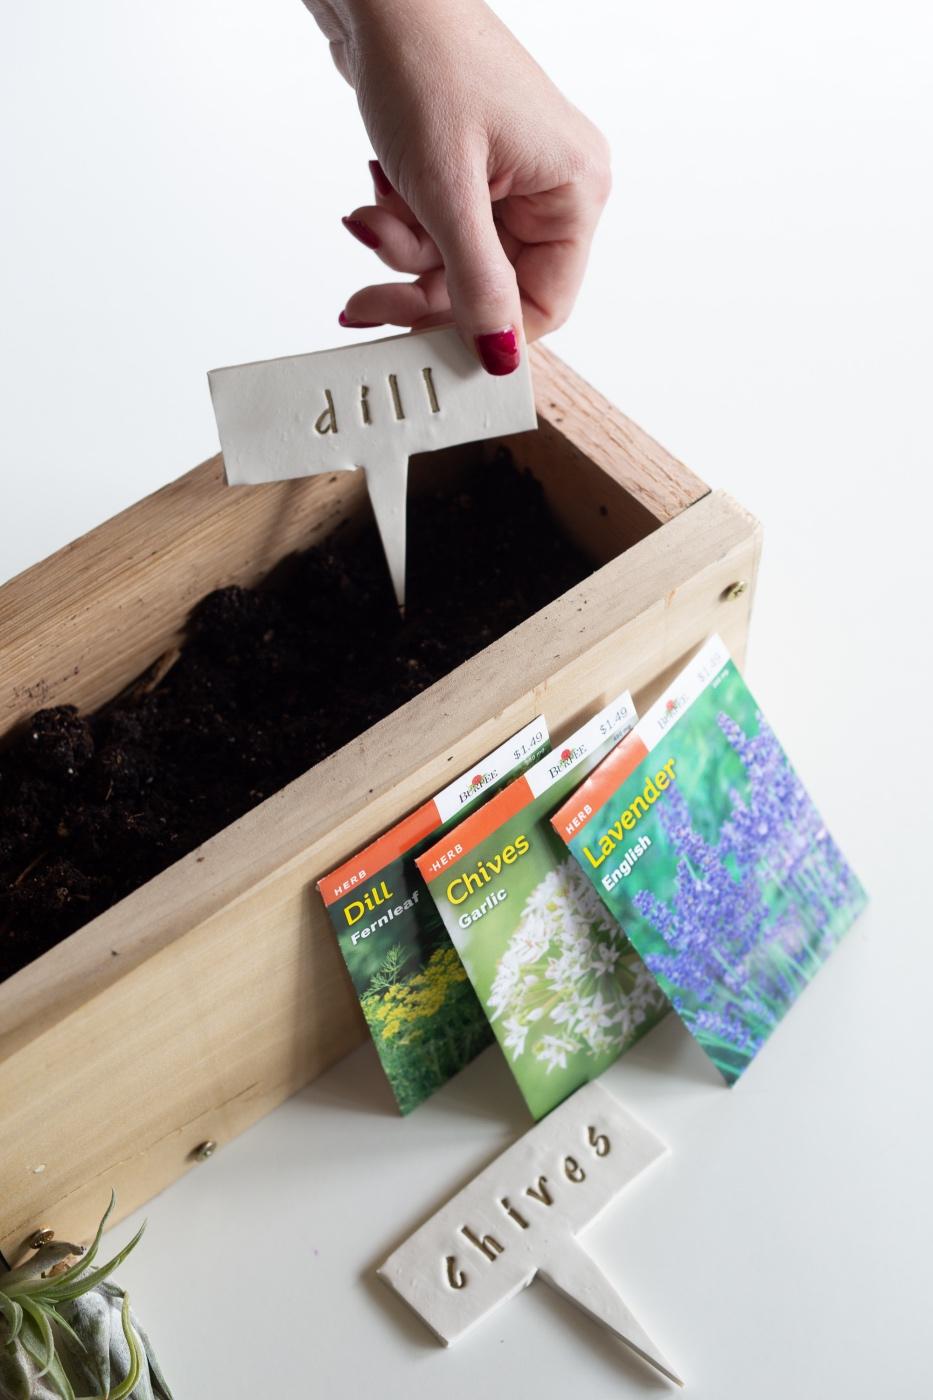 cedar wood planter box with clay garden markers pop shop america